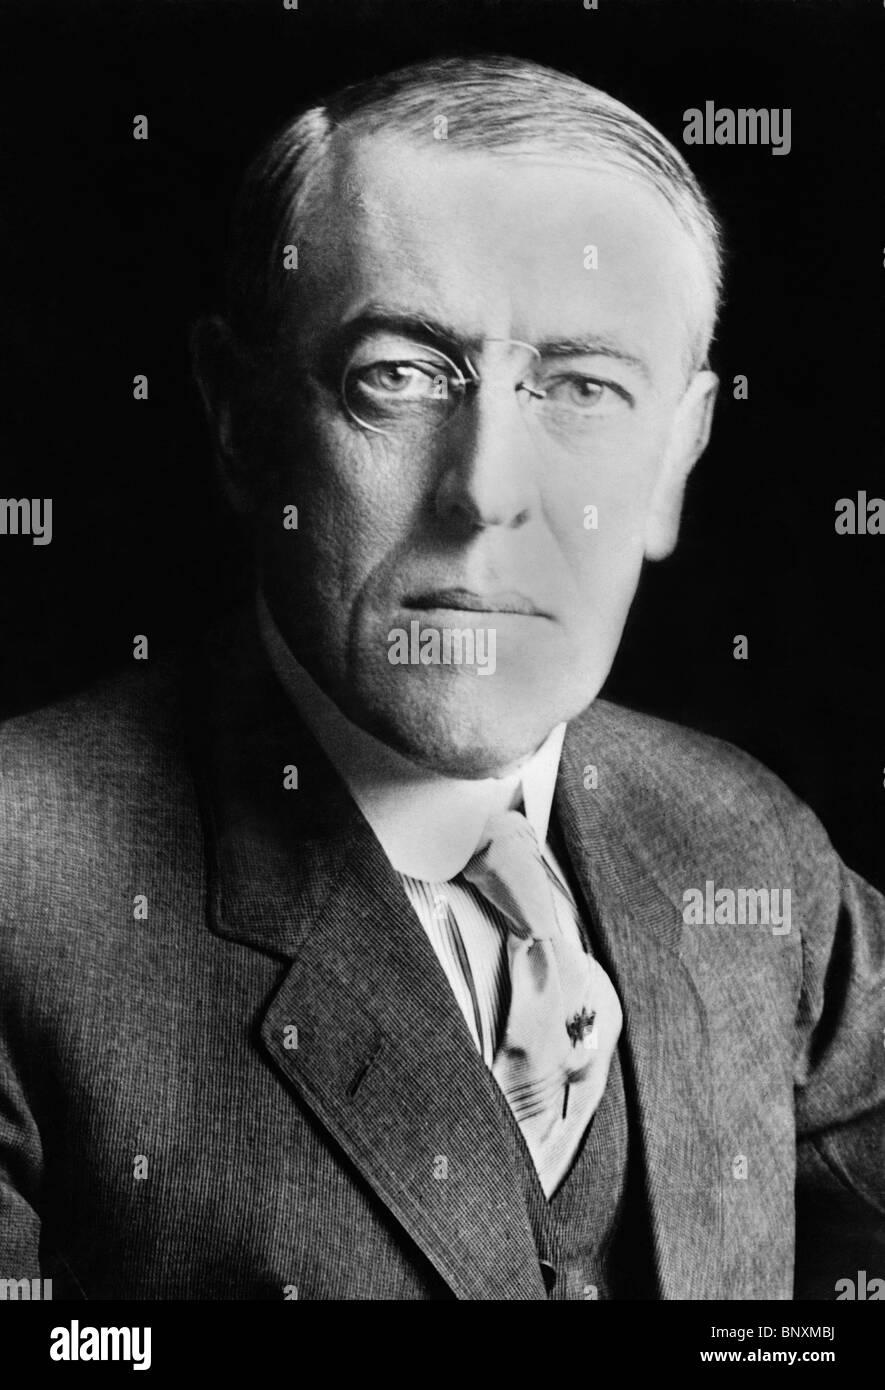 Portrait photo circa 1916 of Woodrow Wilson (1856 - 1924) - the 28th US President (1913 - 1921). - Stock Image